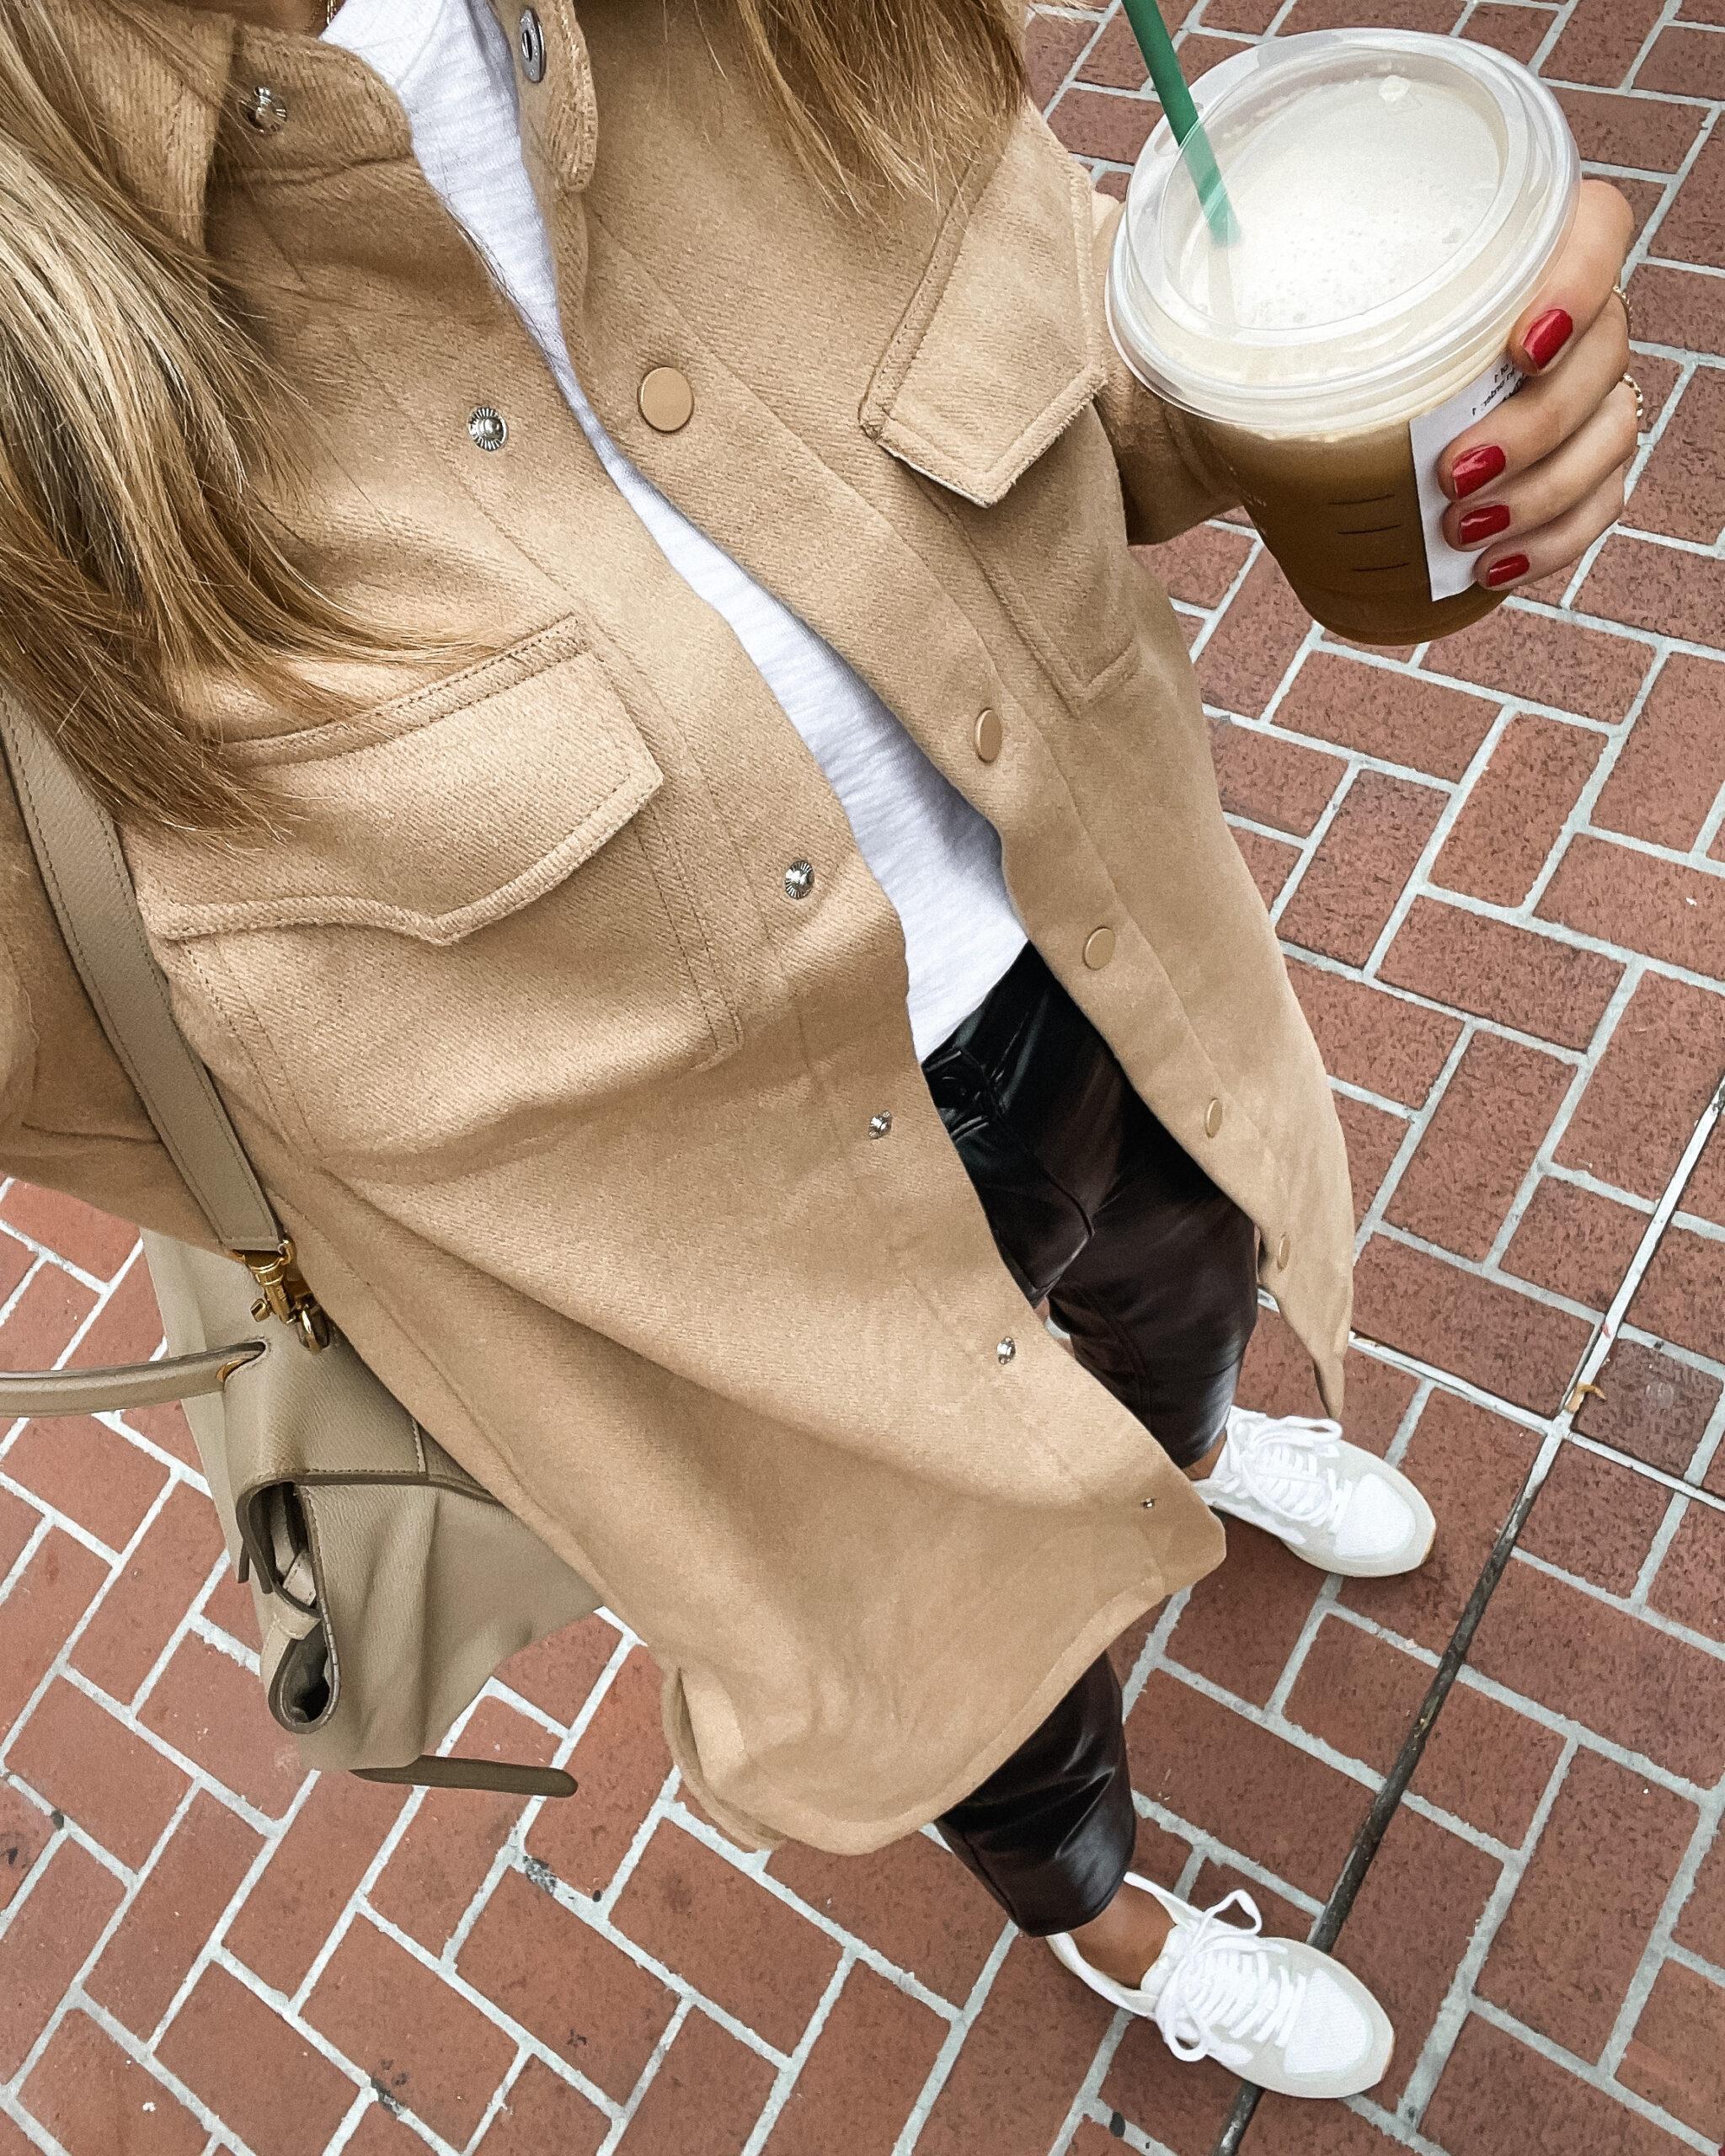 Fashoin Jackson Wearing Abercrombie Camel Long Shacket Black Faux Leather Pants White Veja Sneakers